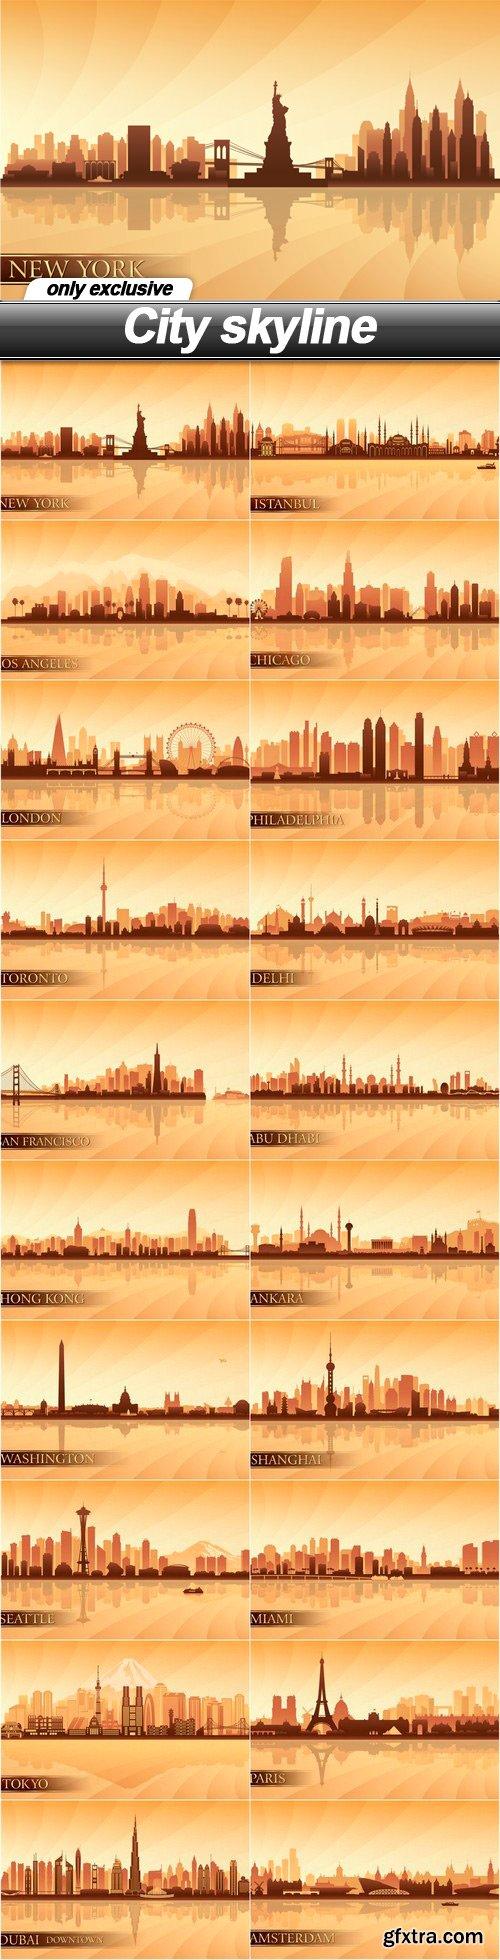 City skyline - 20 EPS